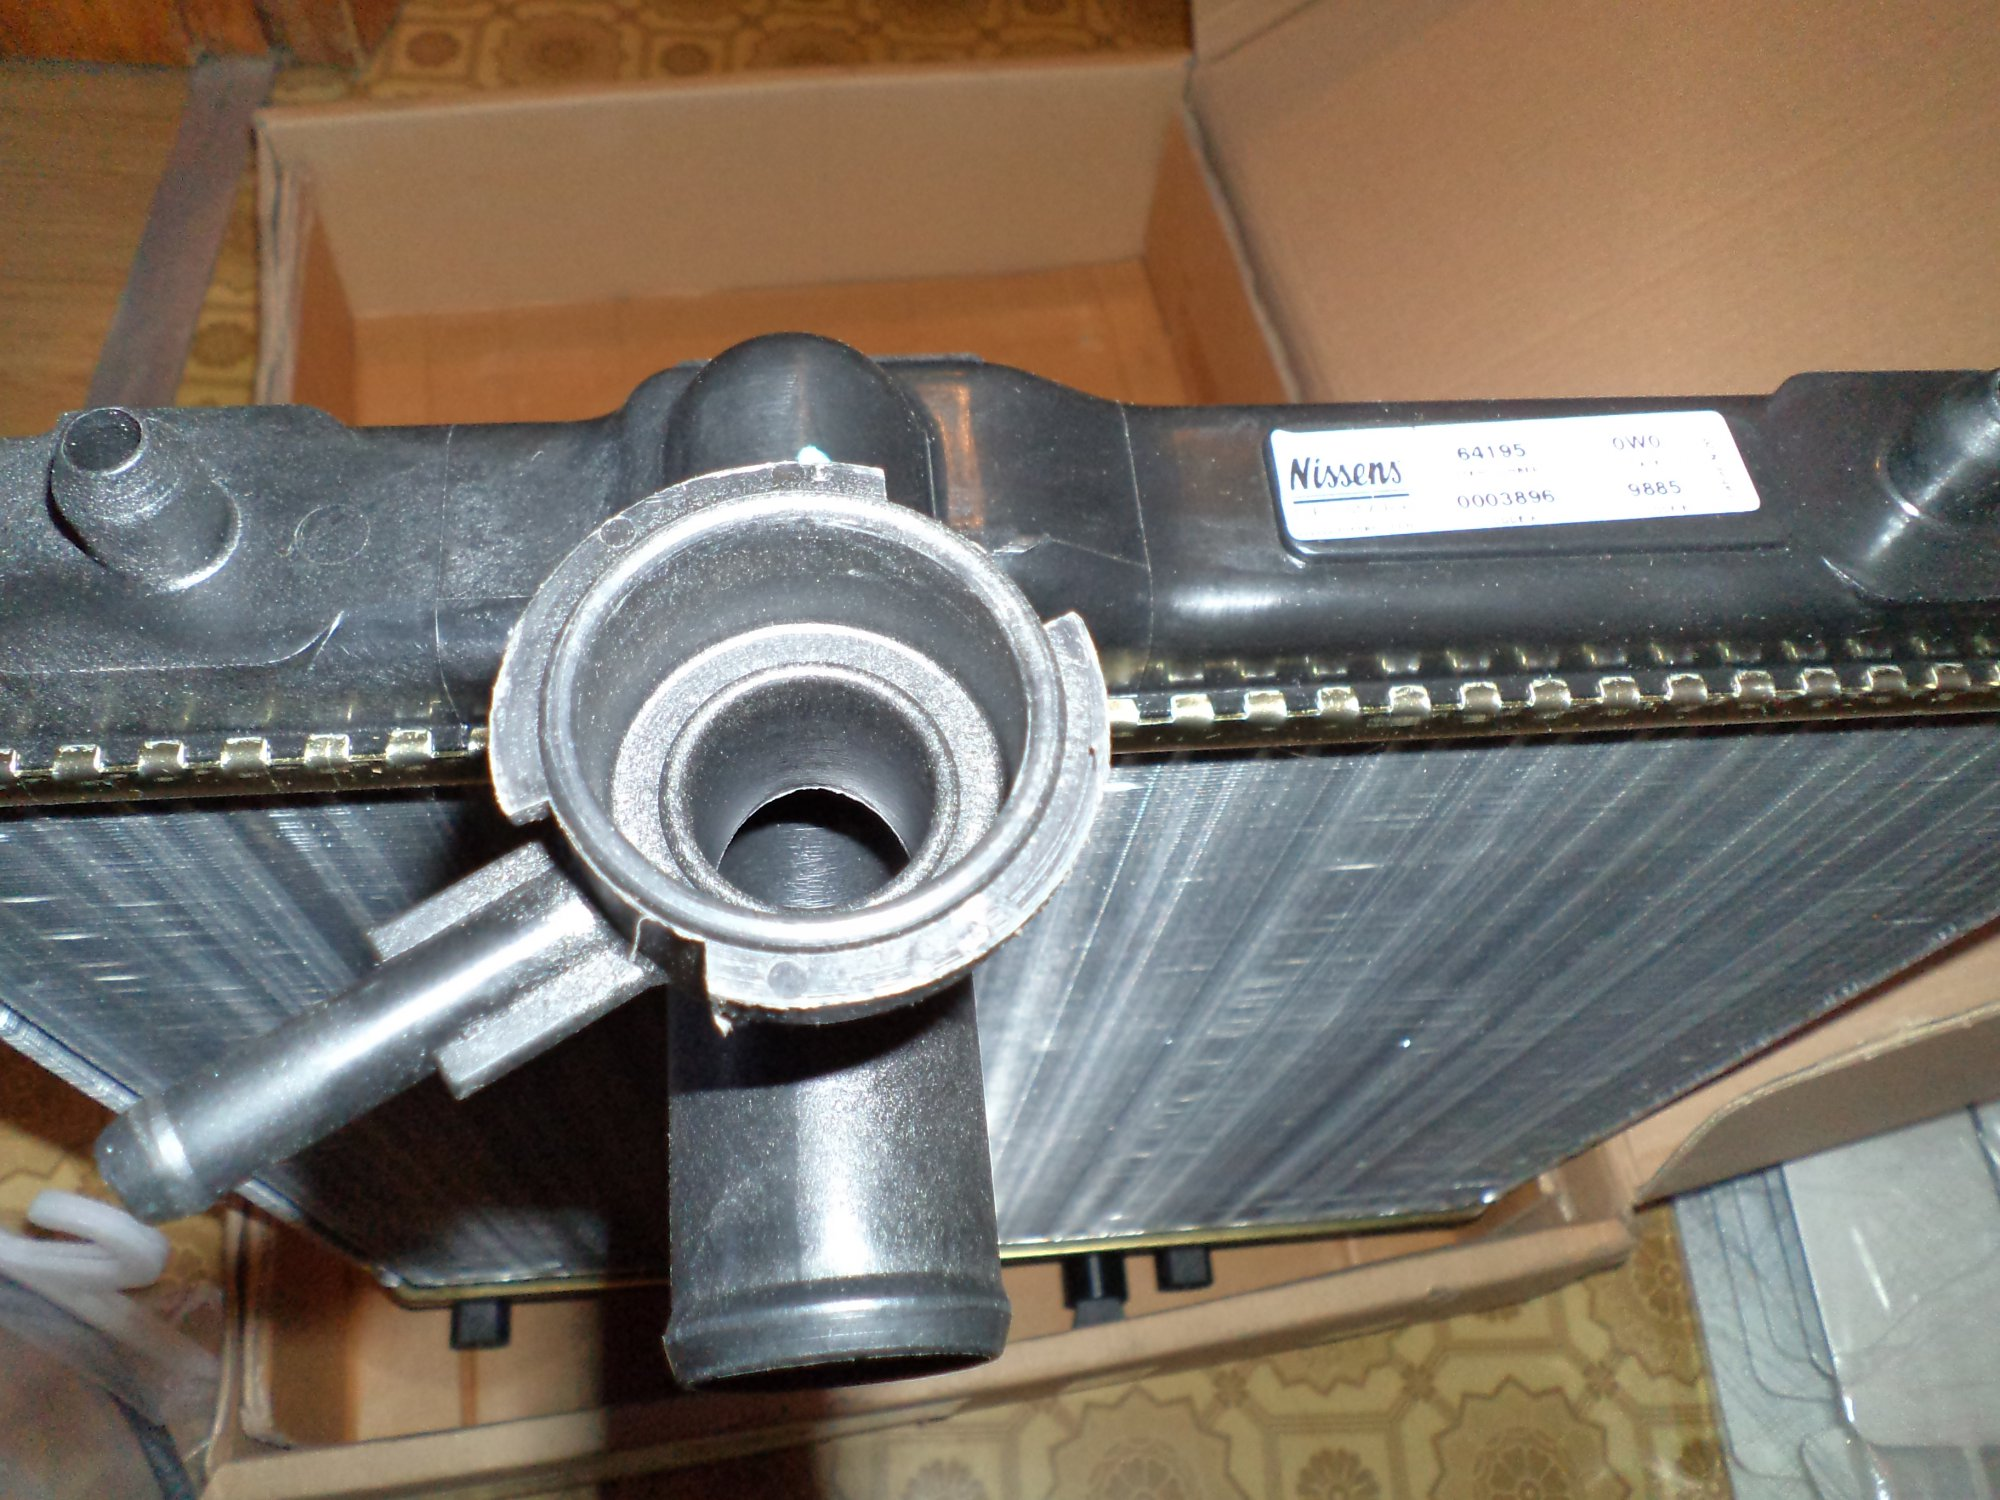 DSC01421.JPG